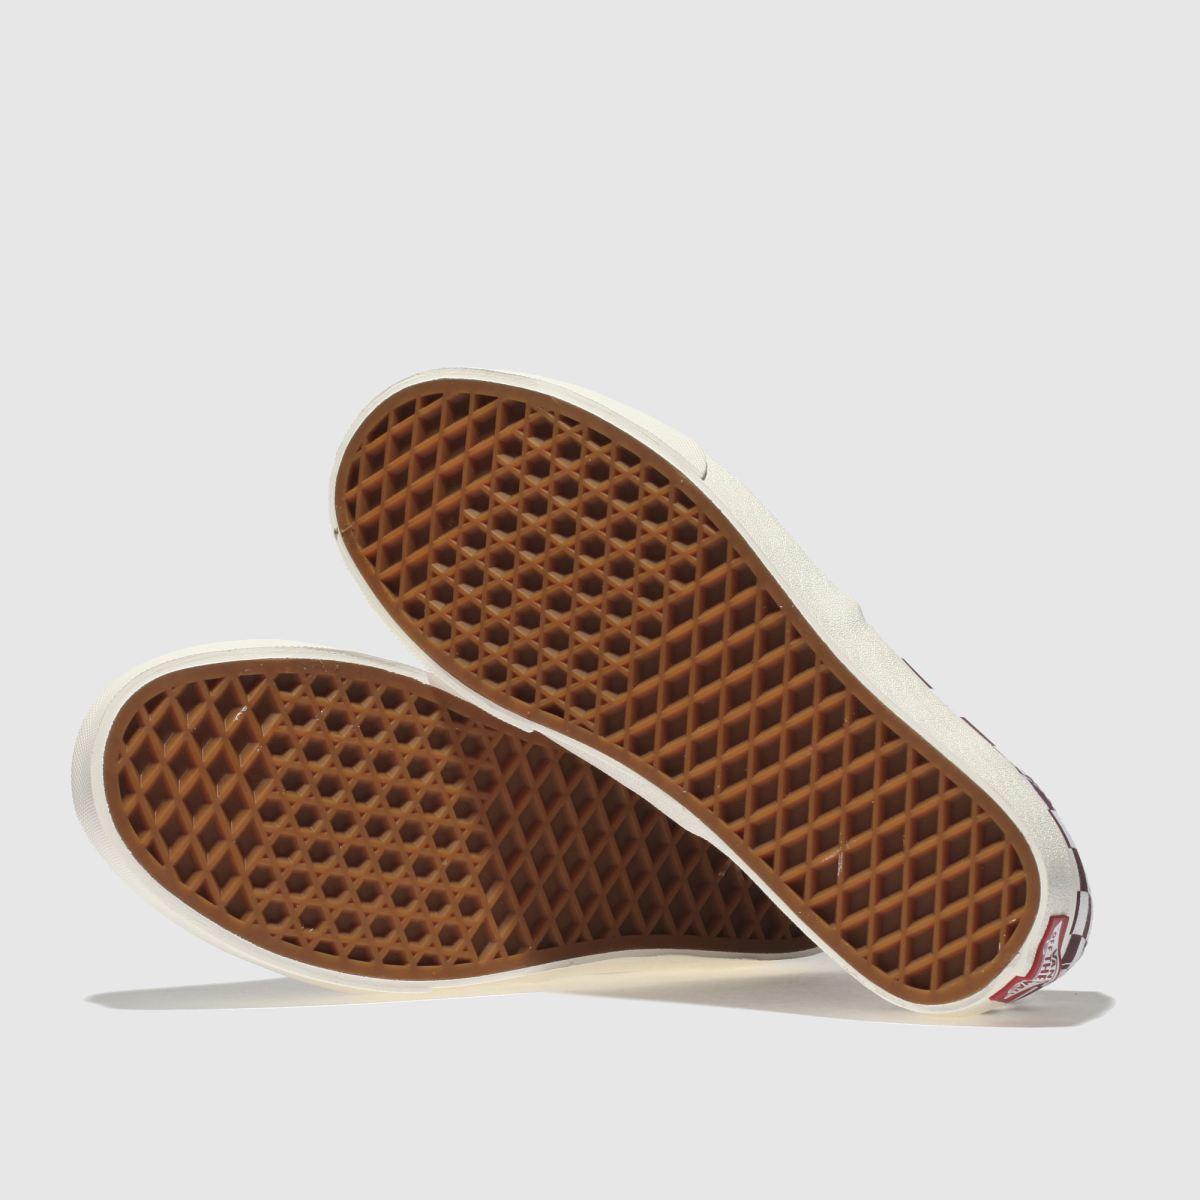 Damen Weiß-weinrot vans Qualität Authentic Sneaker   schuh Gute Qualität vans beliebte Schuhe 863a9b